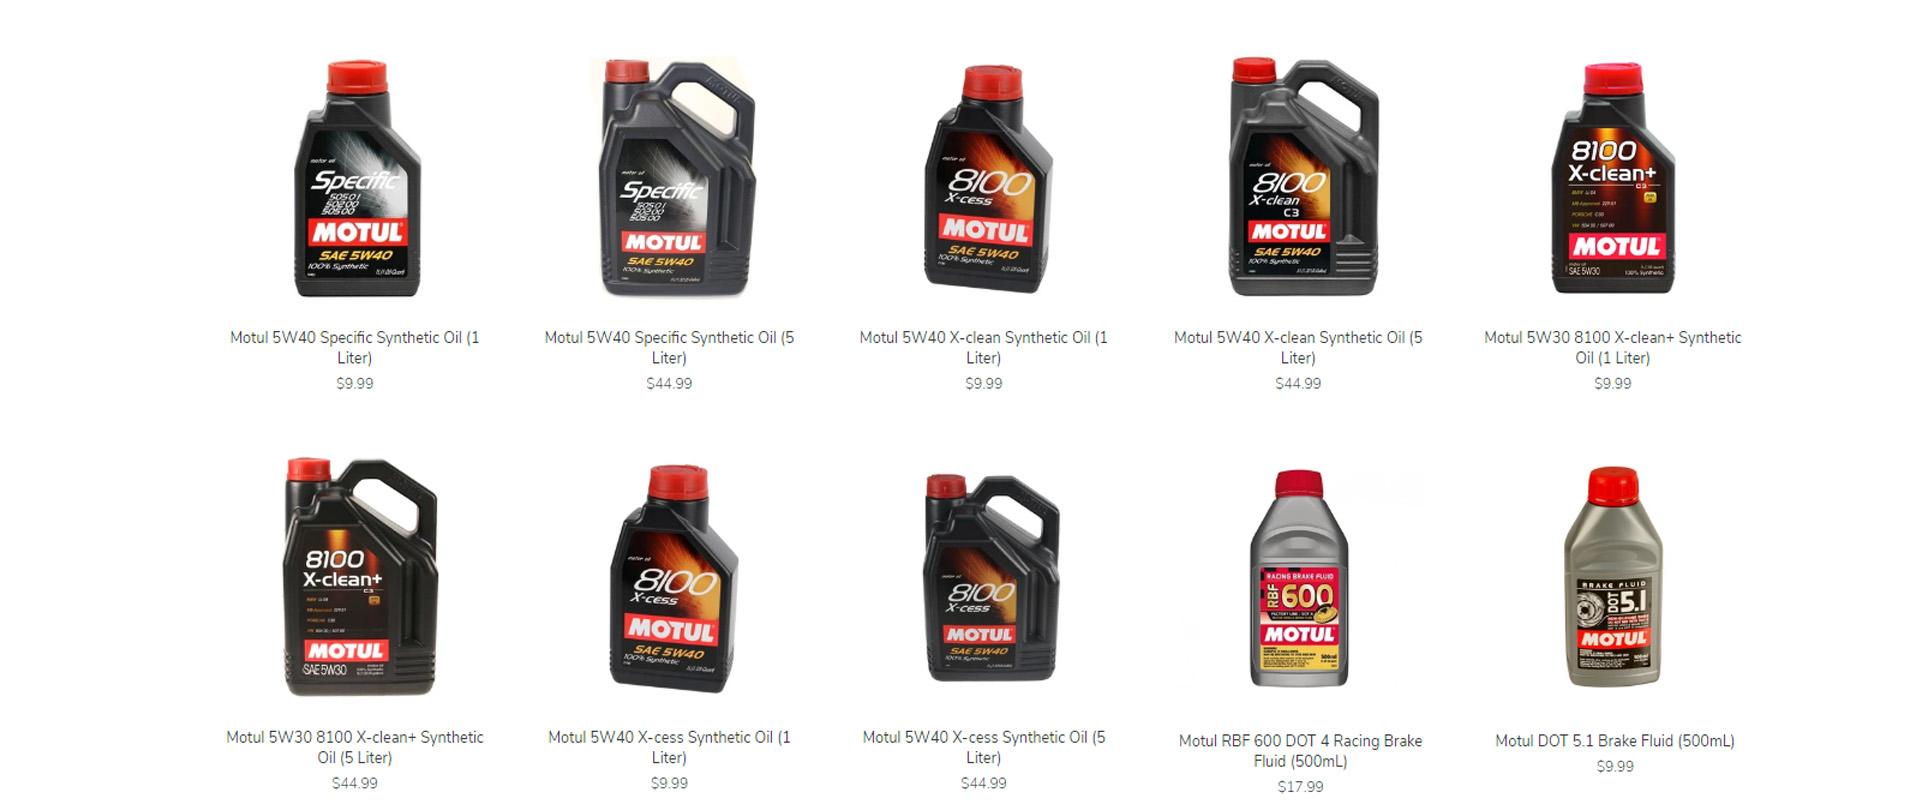 Motul Products